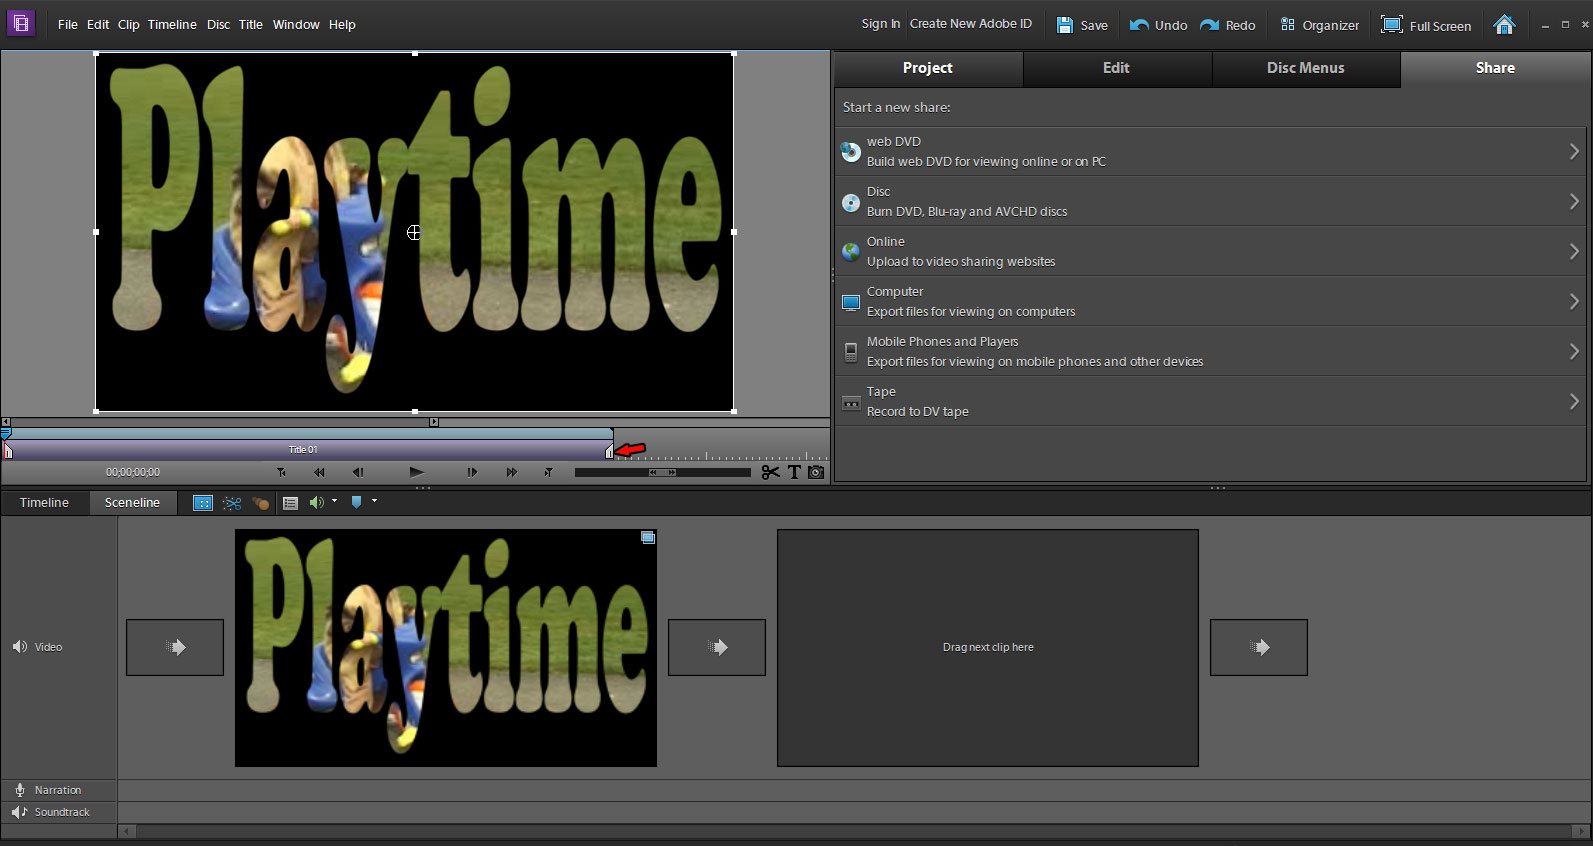 Premiere Elements 10 Windows Sceneline Workspace - Putting Video In Title.